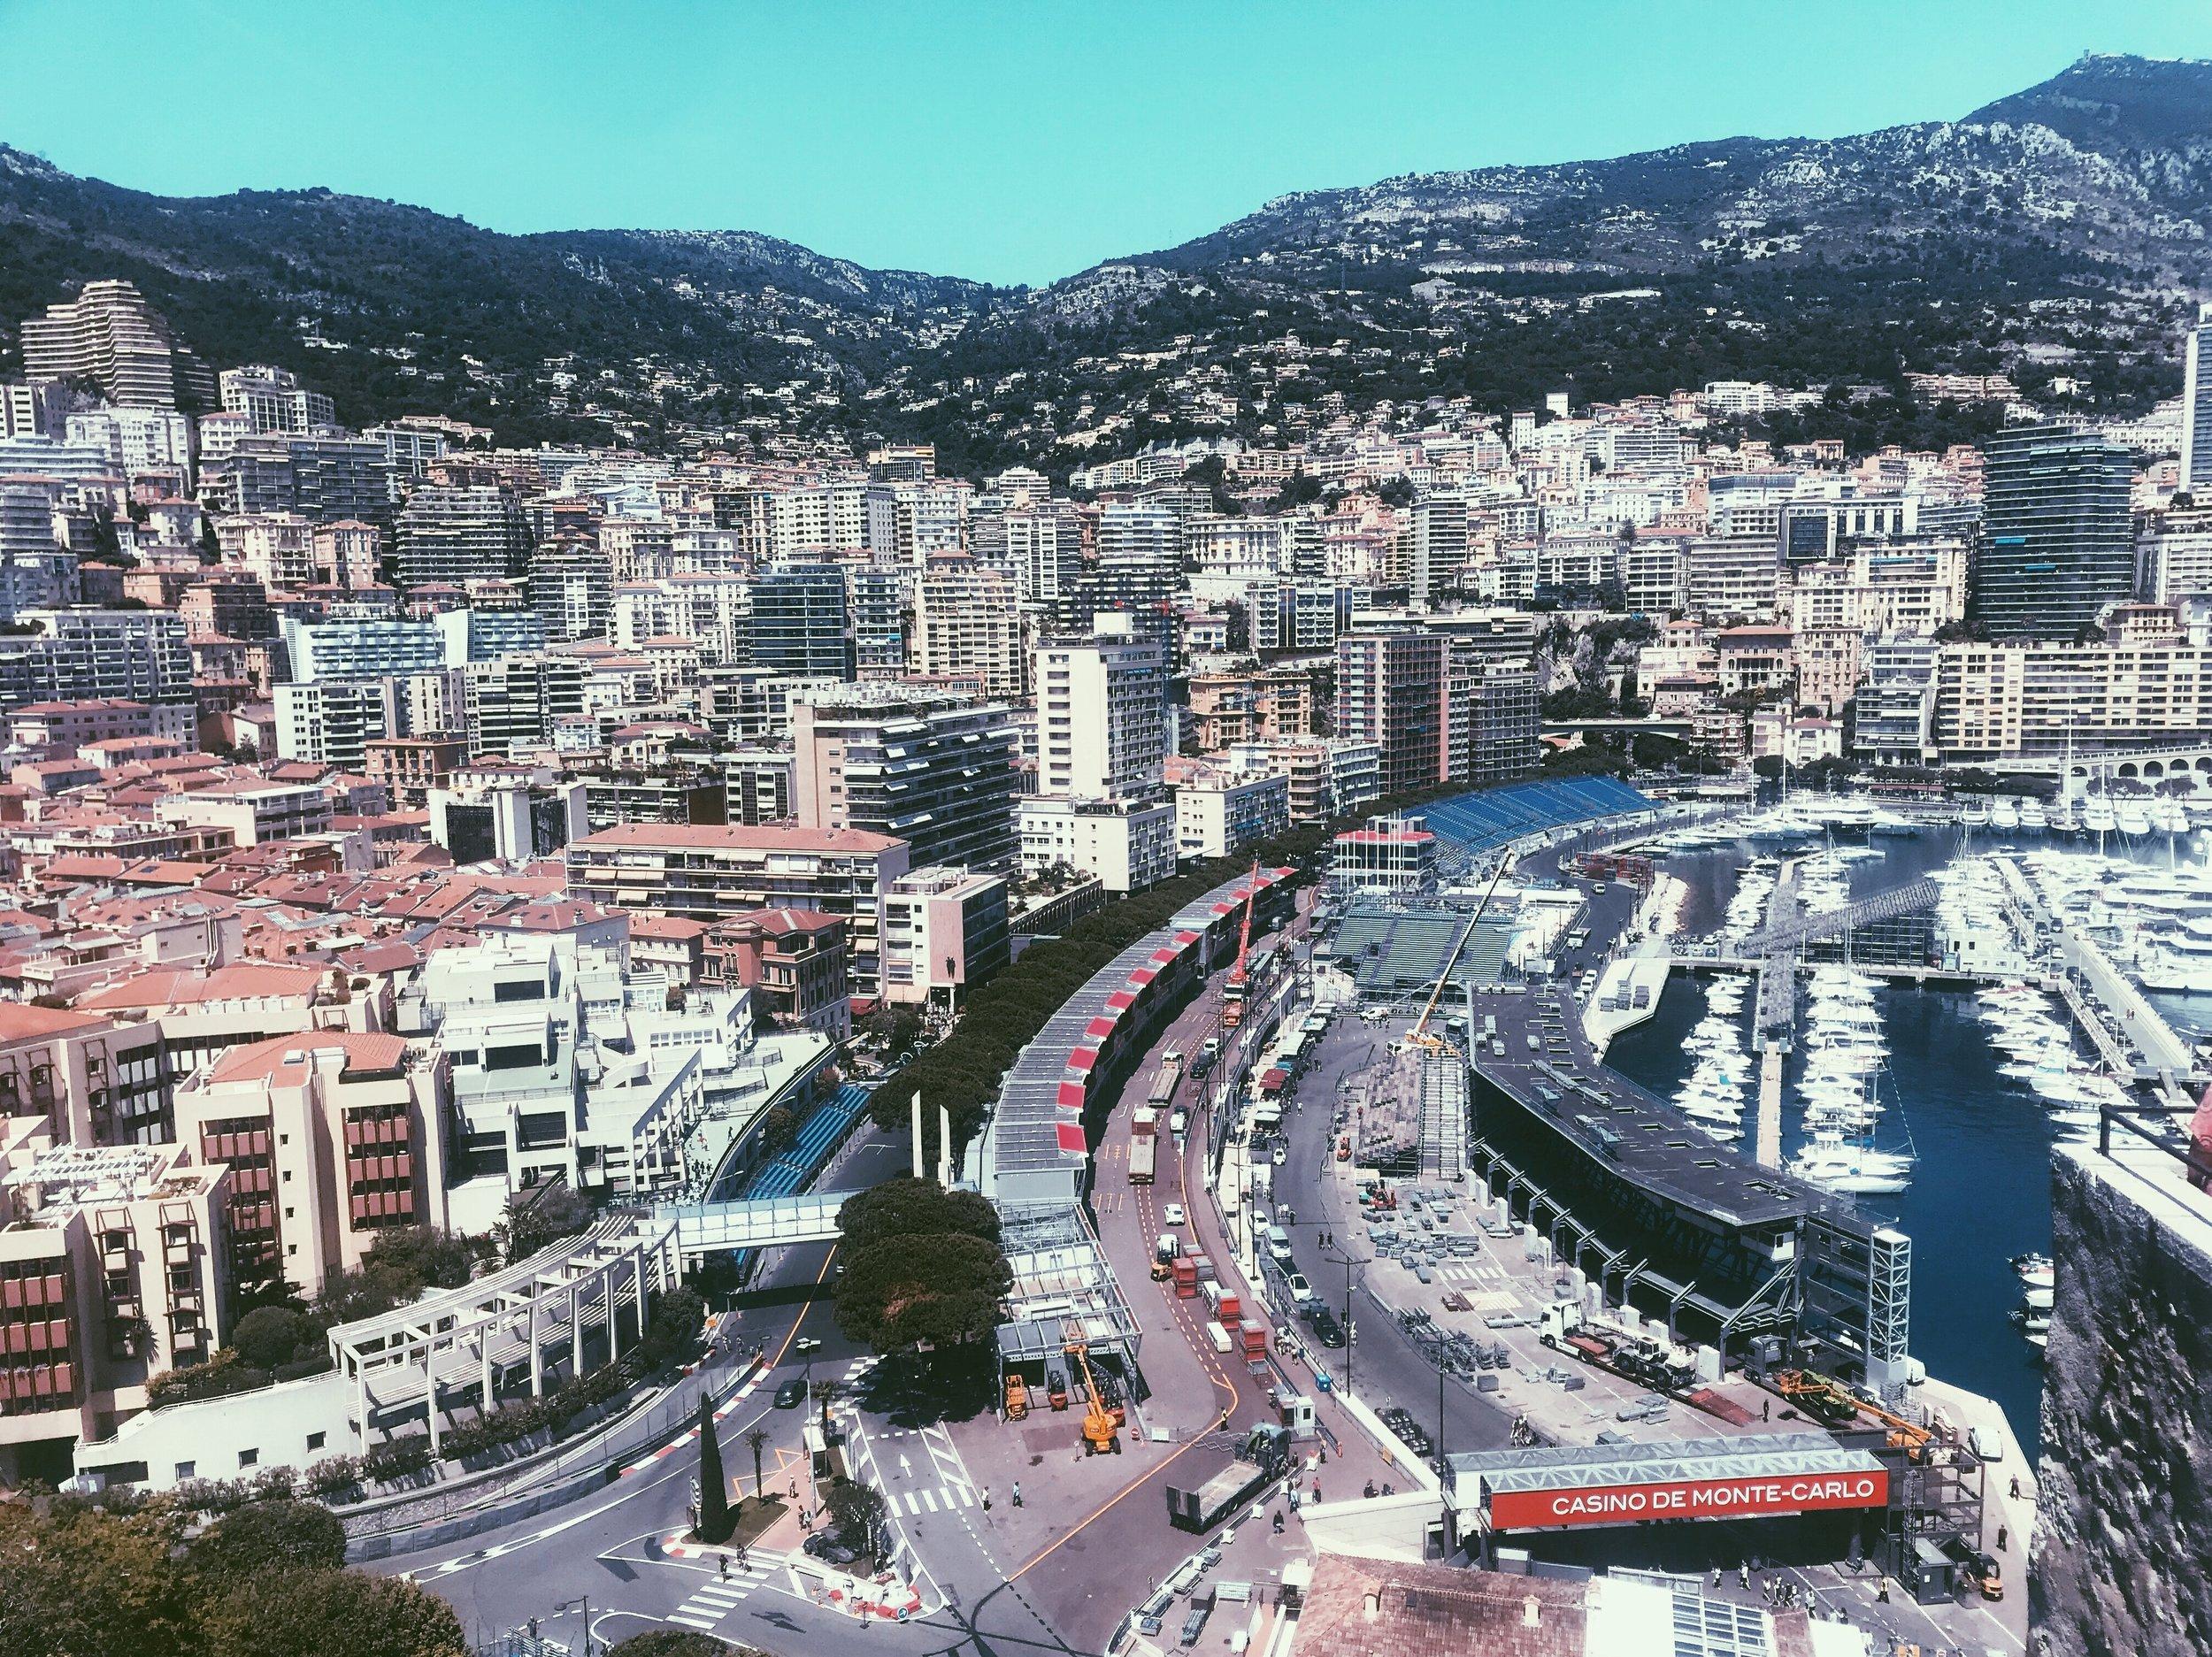 Monaco getting ready for Grand Prix weekend.